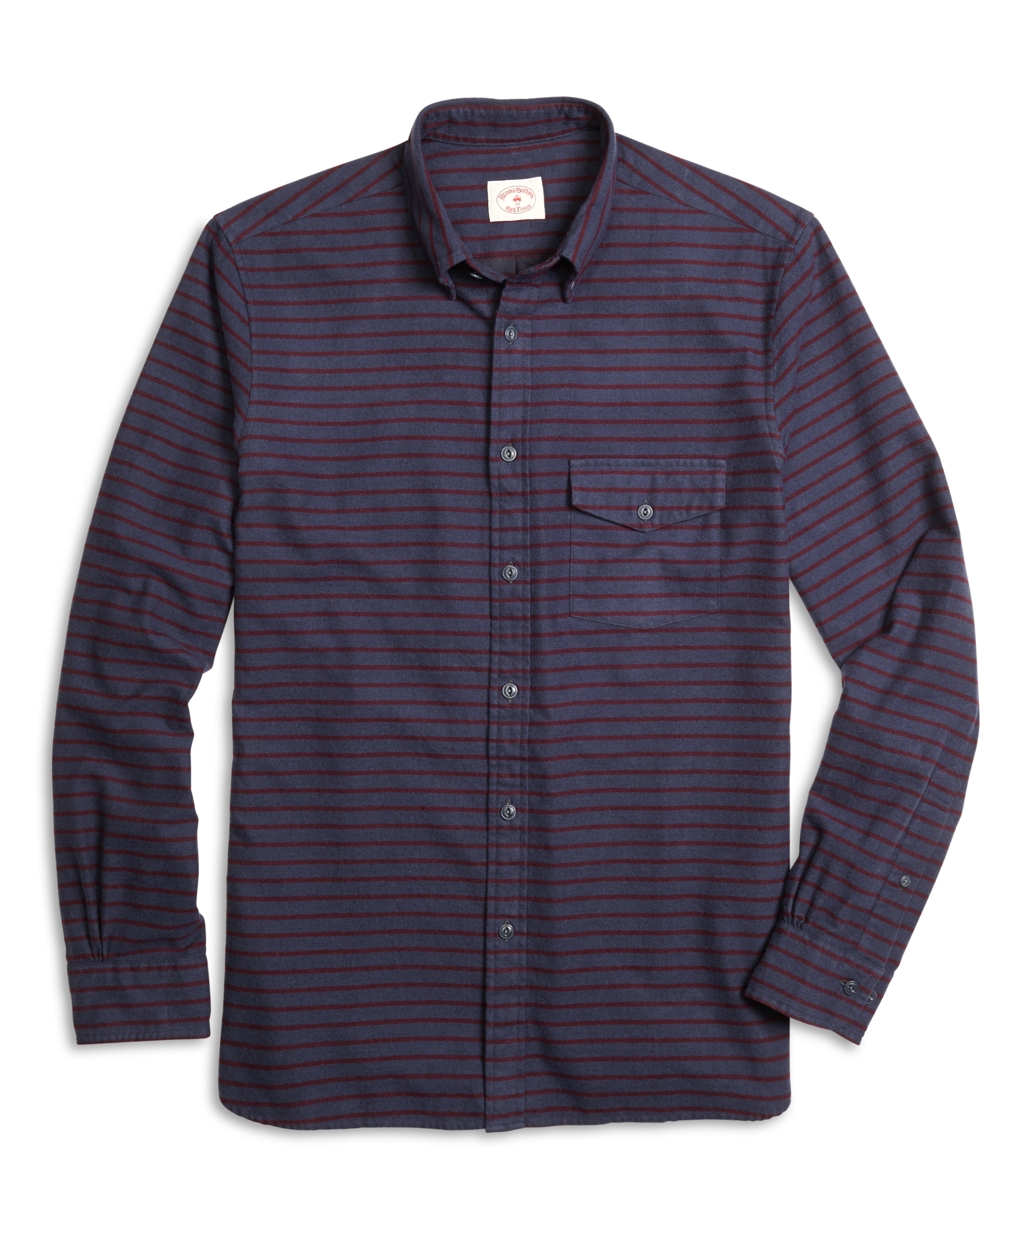 Lyst brooks brothers stripe flannel sport shirt in blue for Brooks brothers sports shirts